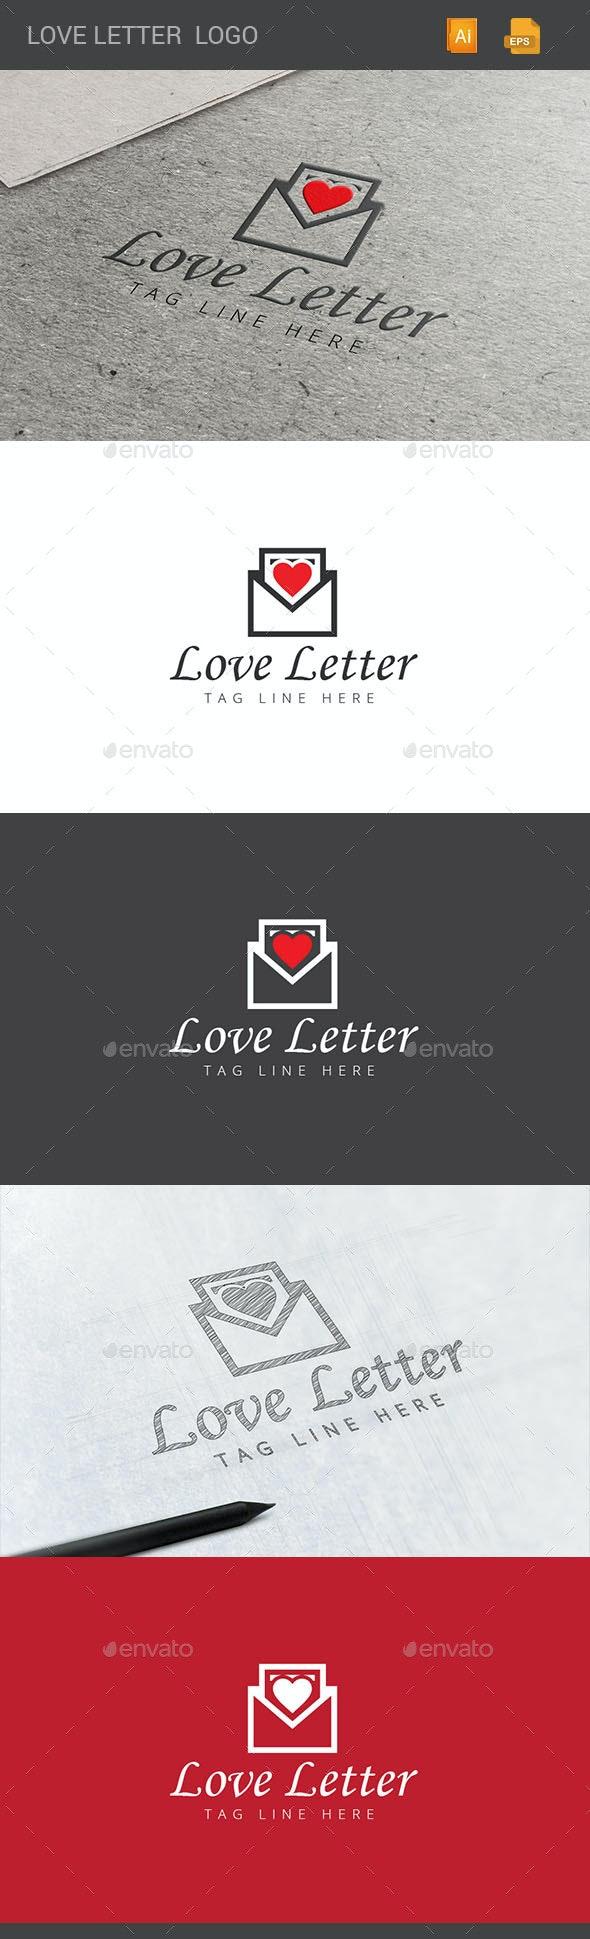 Love Letter Logo - Objects Logo Templates